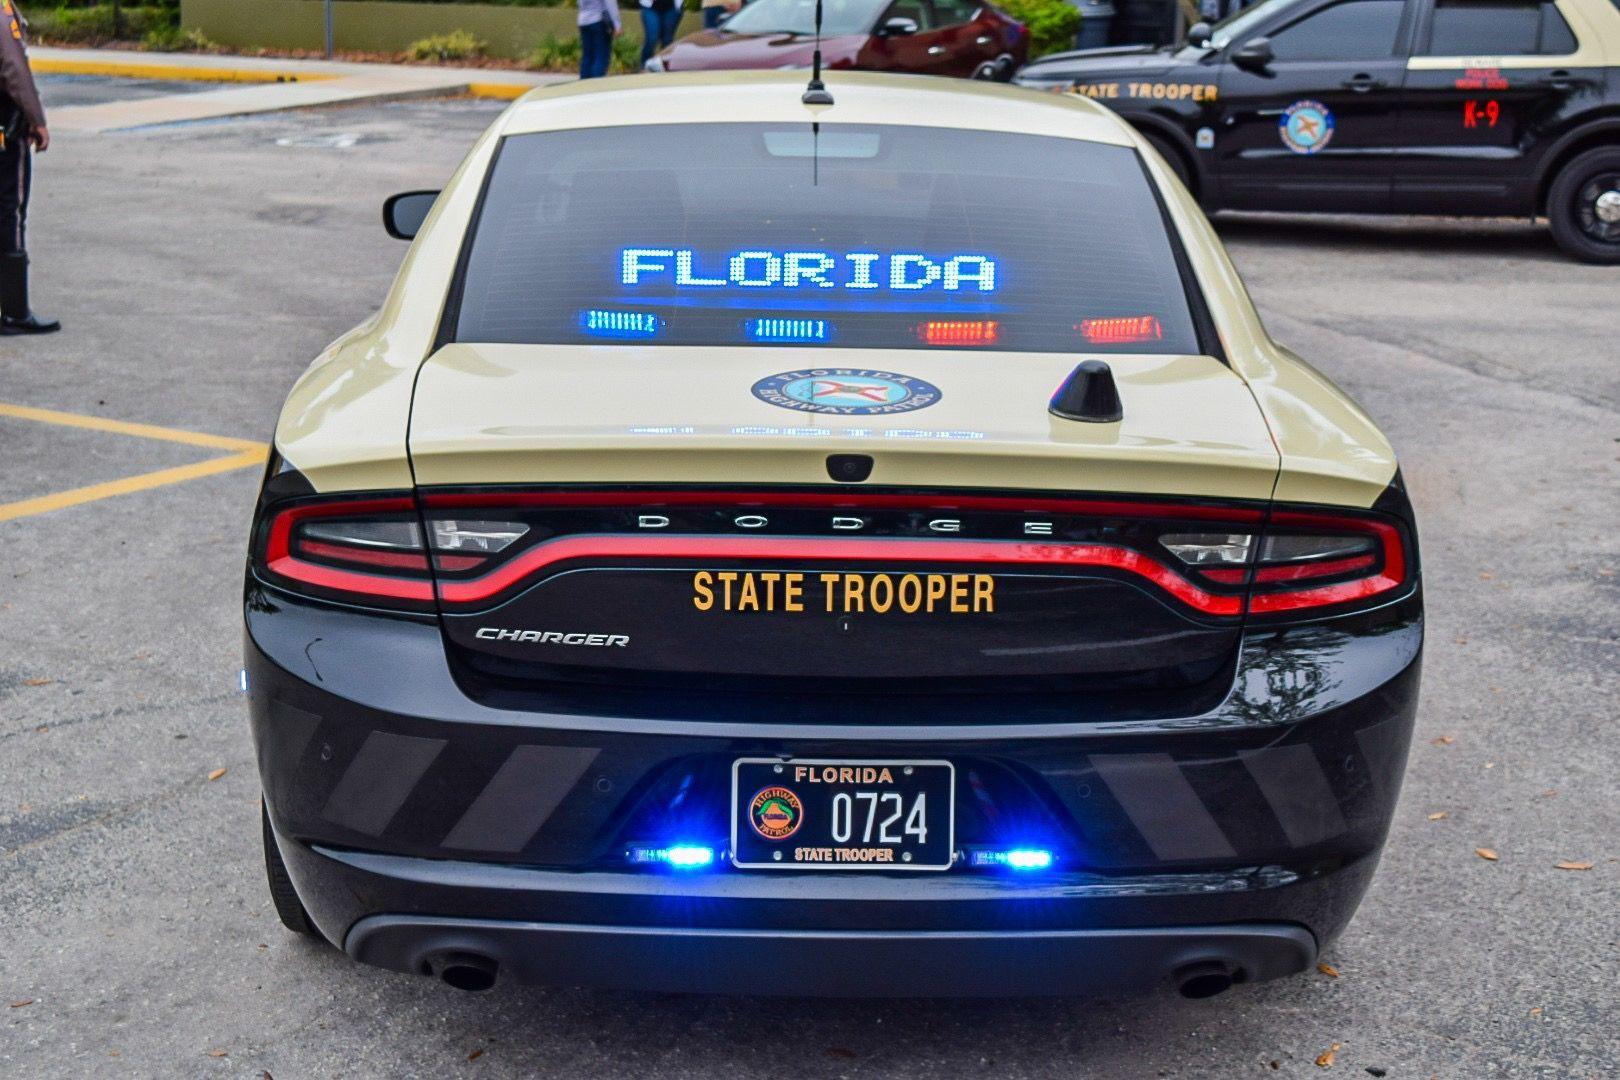 Pin by Cody Jo Olson on Florida Highway Patrol Vehicles